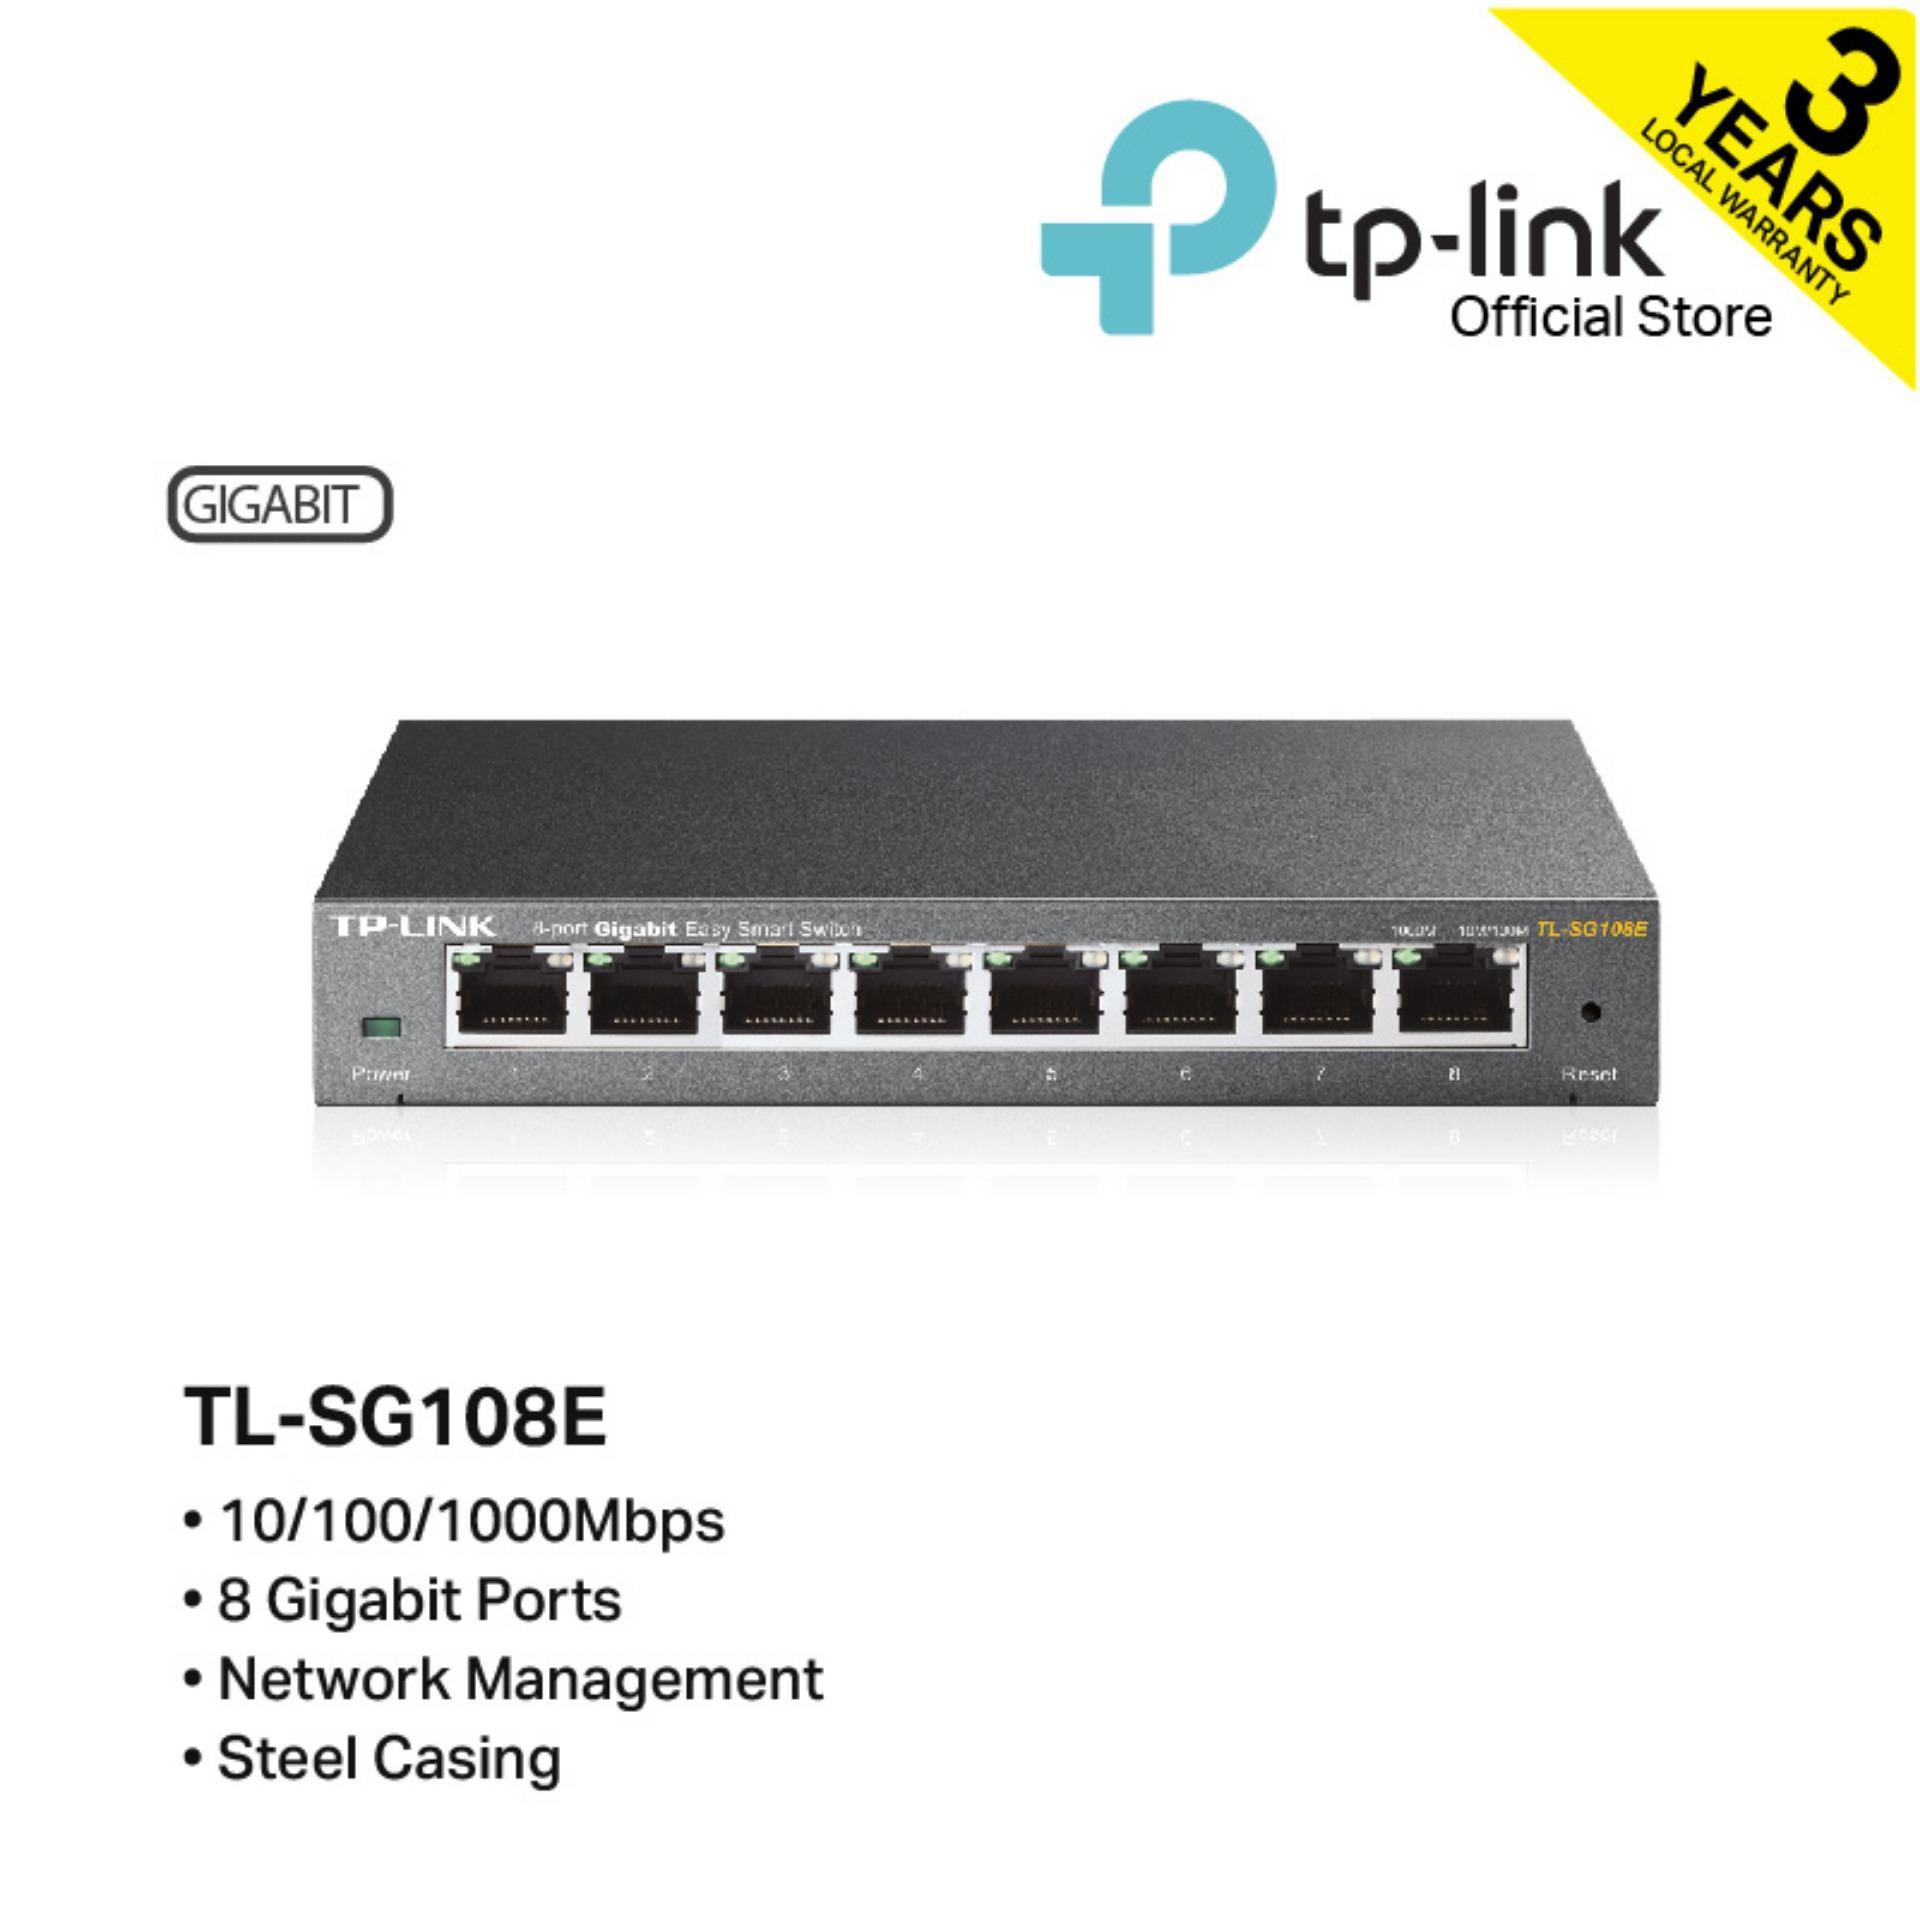 Latest Tp Link Switches Products Enjoy Huge Discounts Lazada Sg Switch Hub 8 Port Ethernet D Tl Sg108e Gigabit Unmanaged Pro